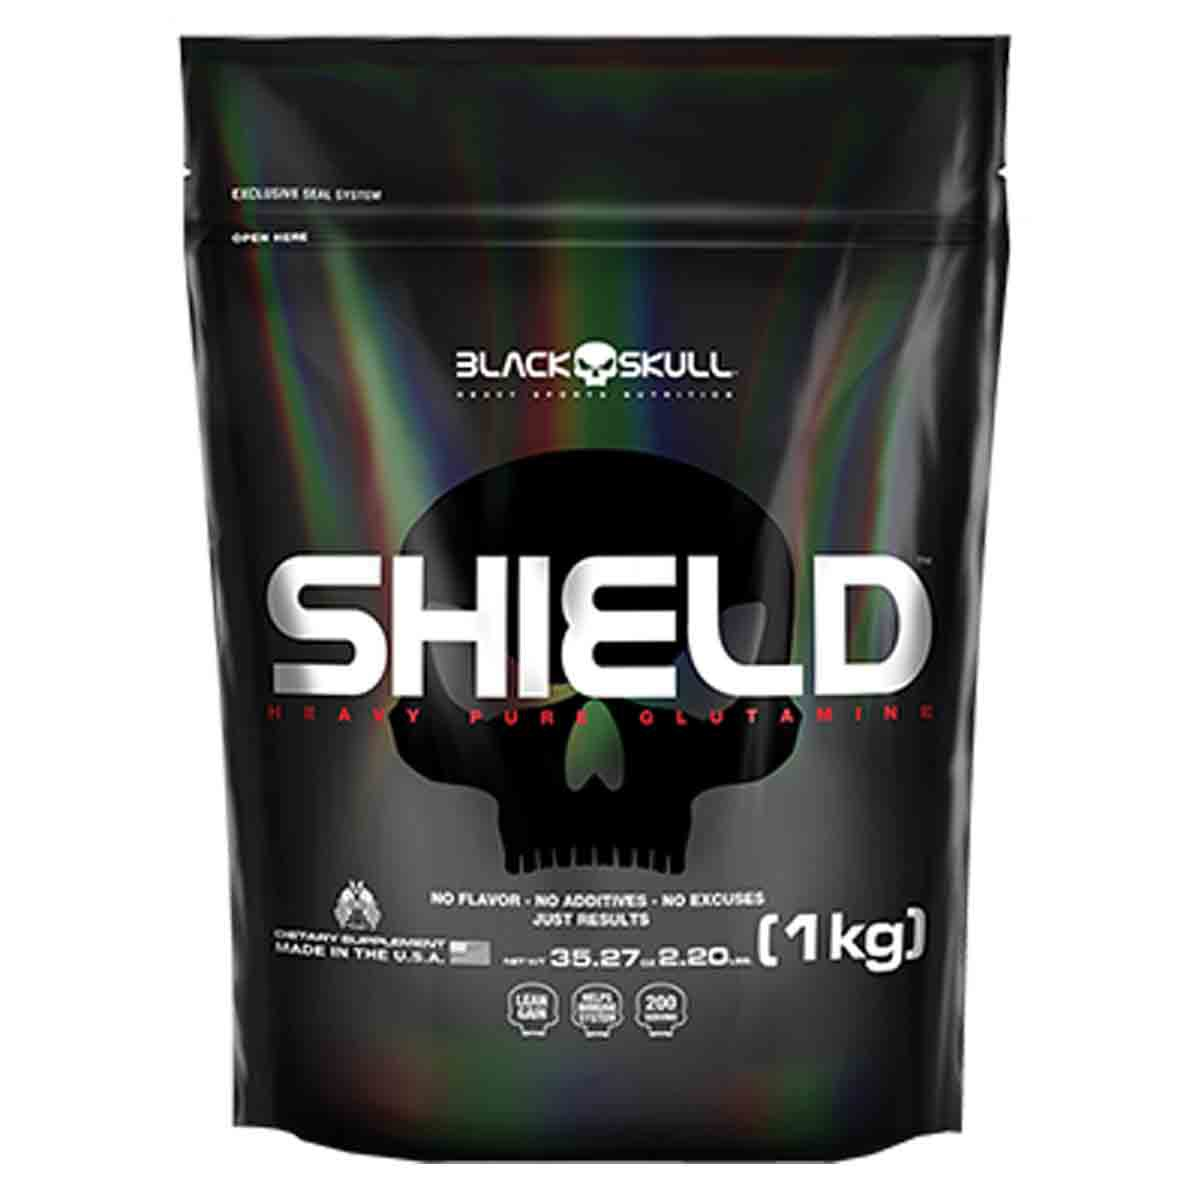 Shield 1kg - Black Skull